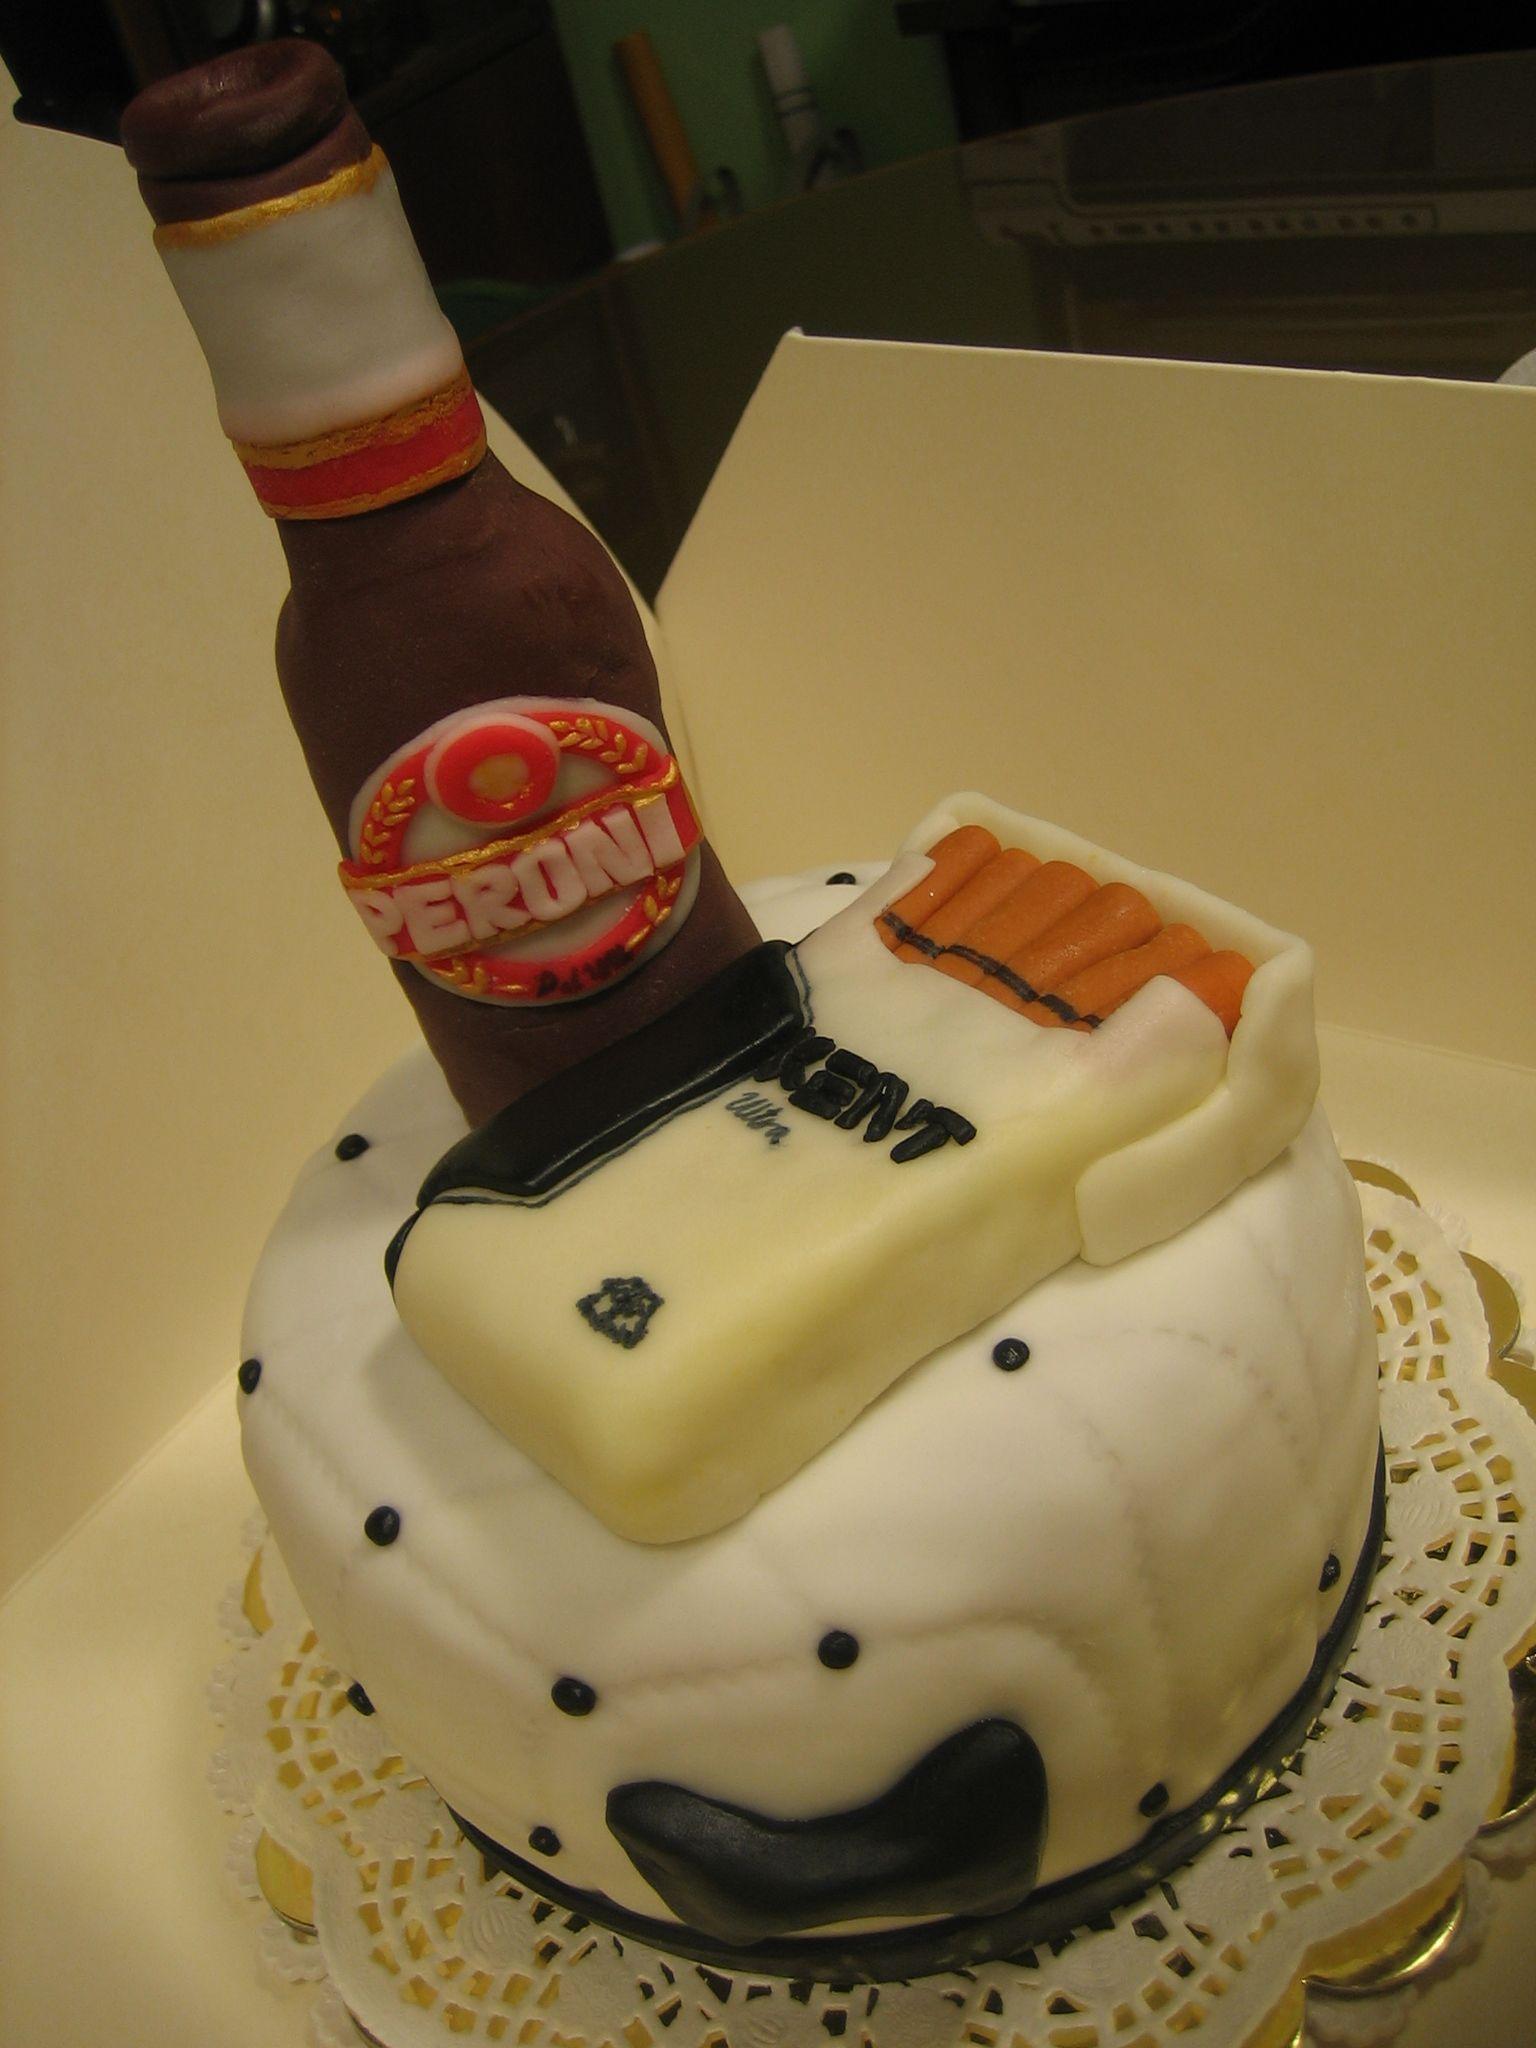 Beer And Cigarettes Cake Diy My Diy Pinterest Cake